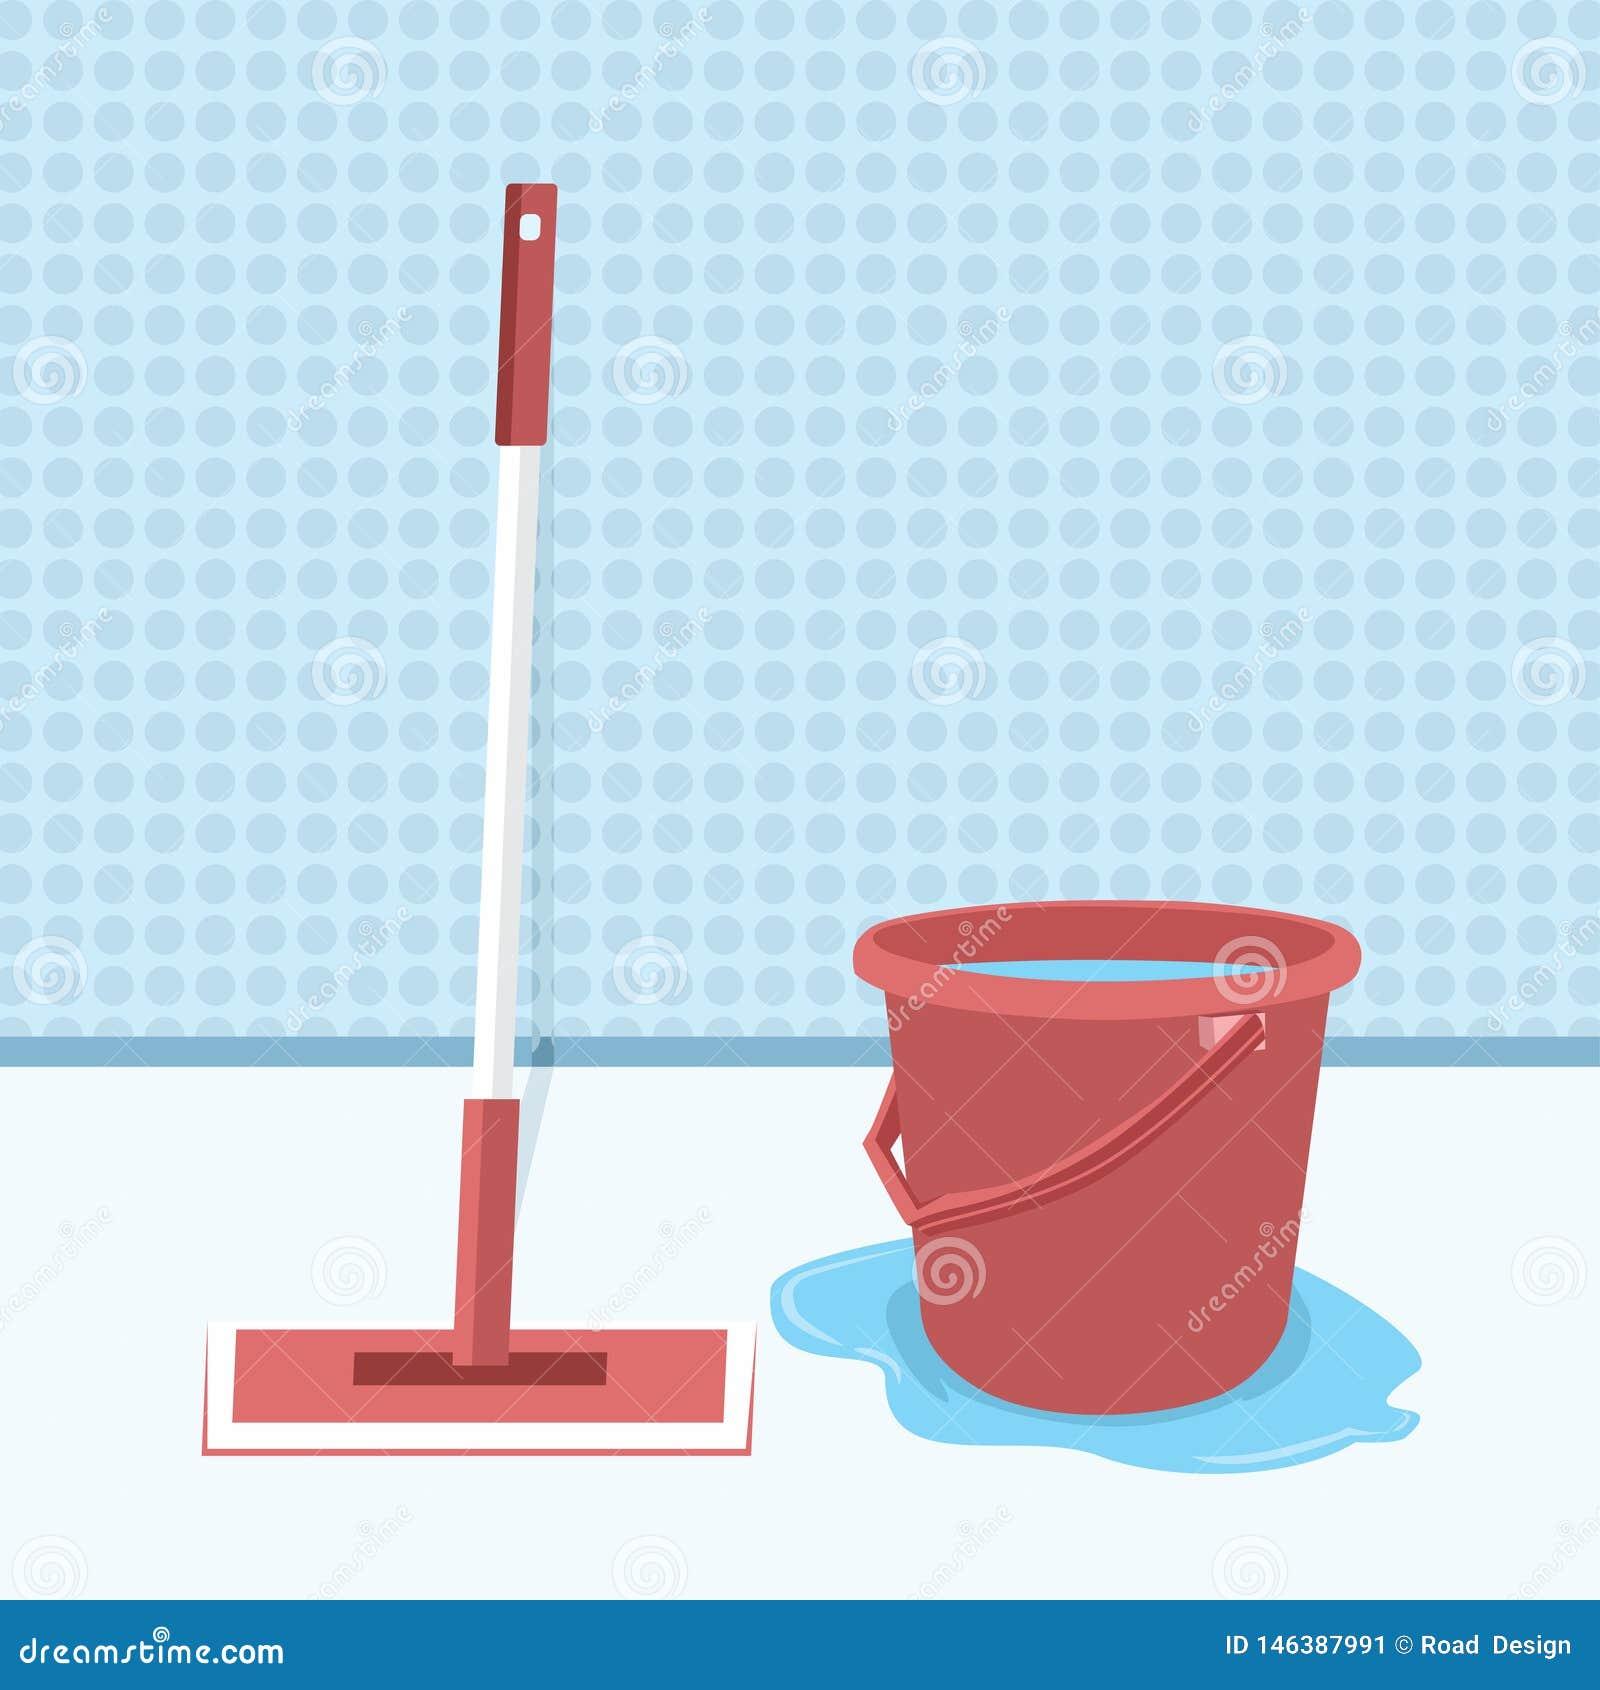 Mop και κάδος με τη διανυσματική απεικόνιση νερού, Mopping το επίπεδο σχέδιο πατωμάτων Υγρός καθαρισμός Καθαρό δωμάτιο Καθαρισμός